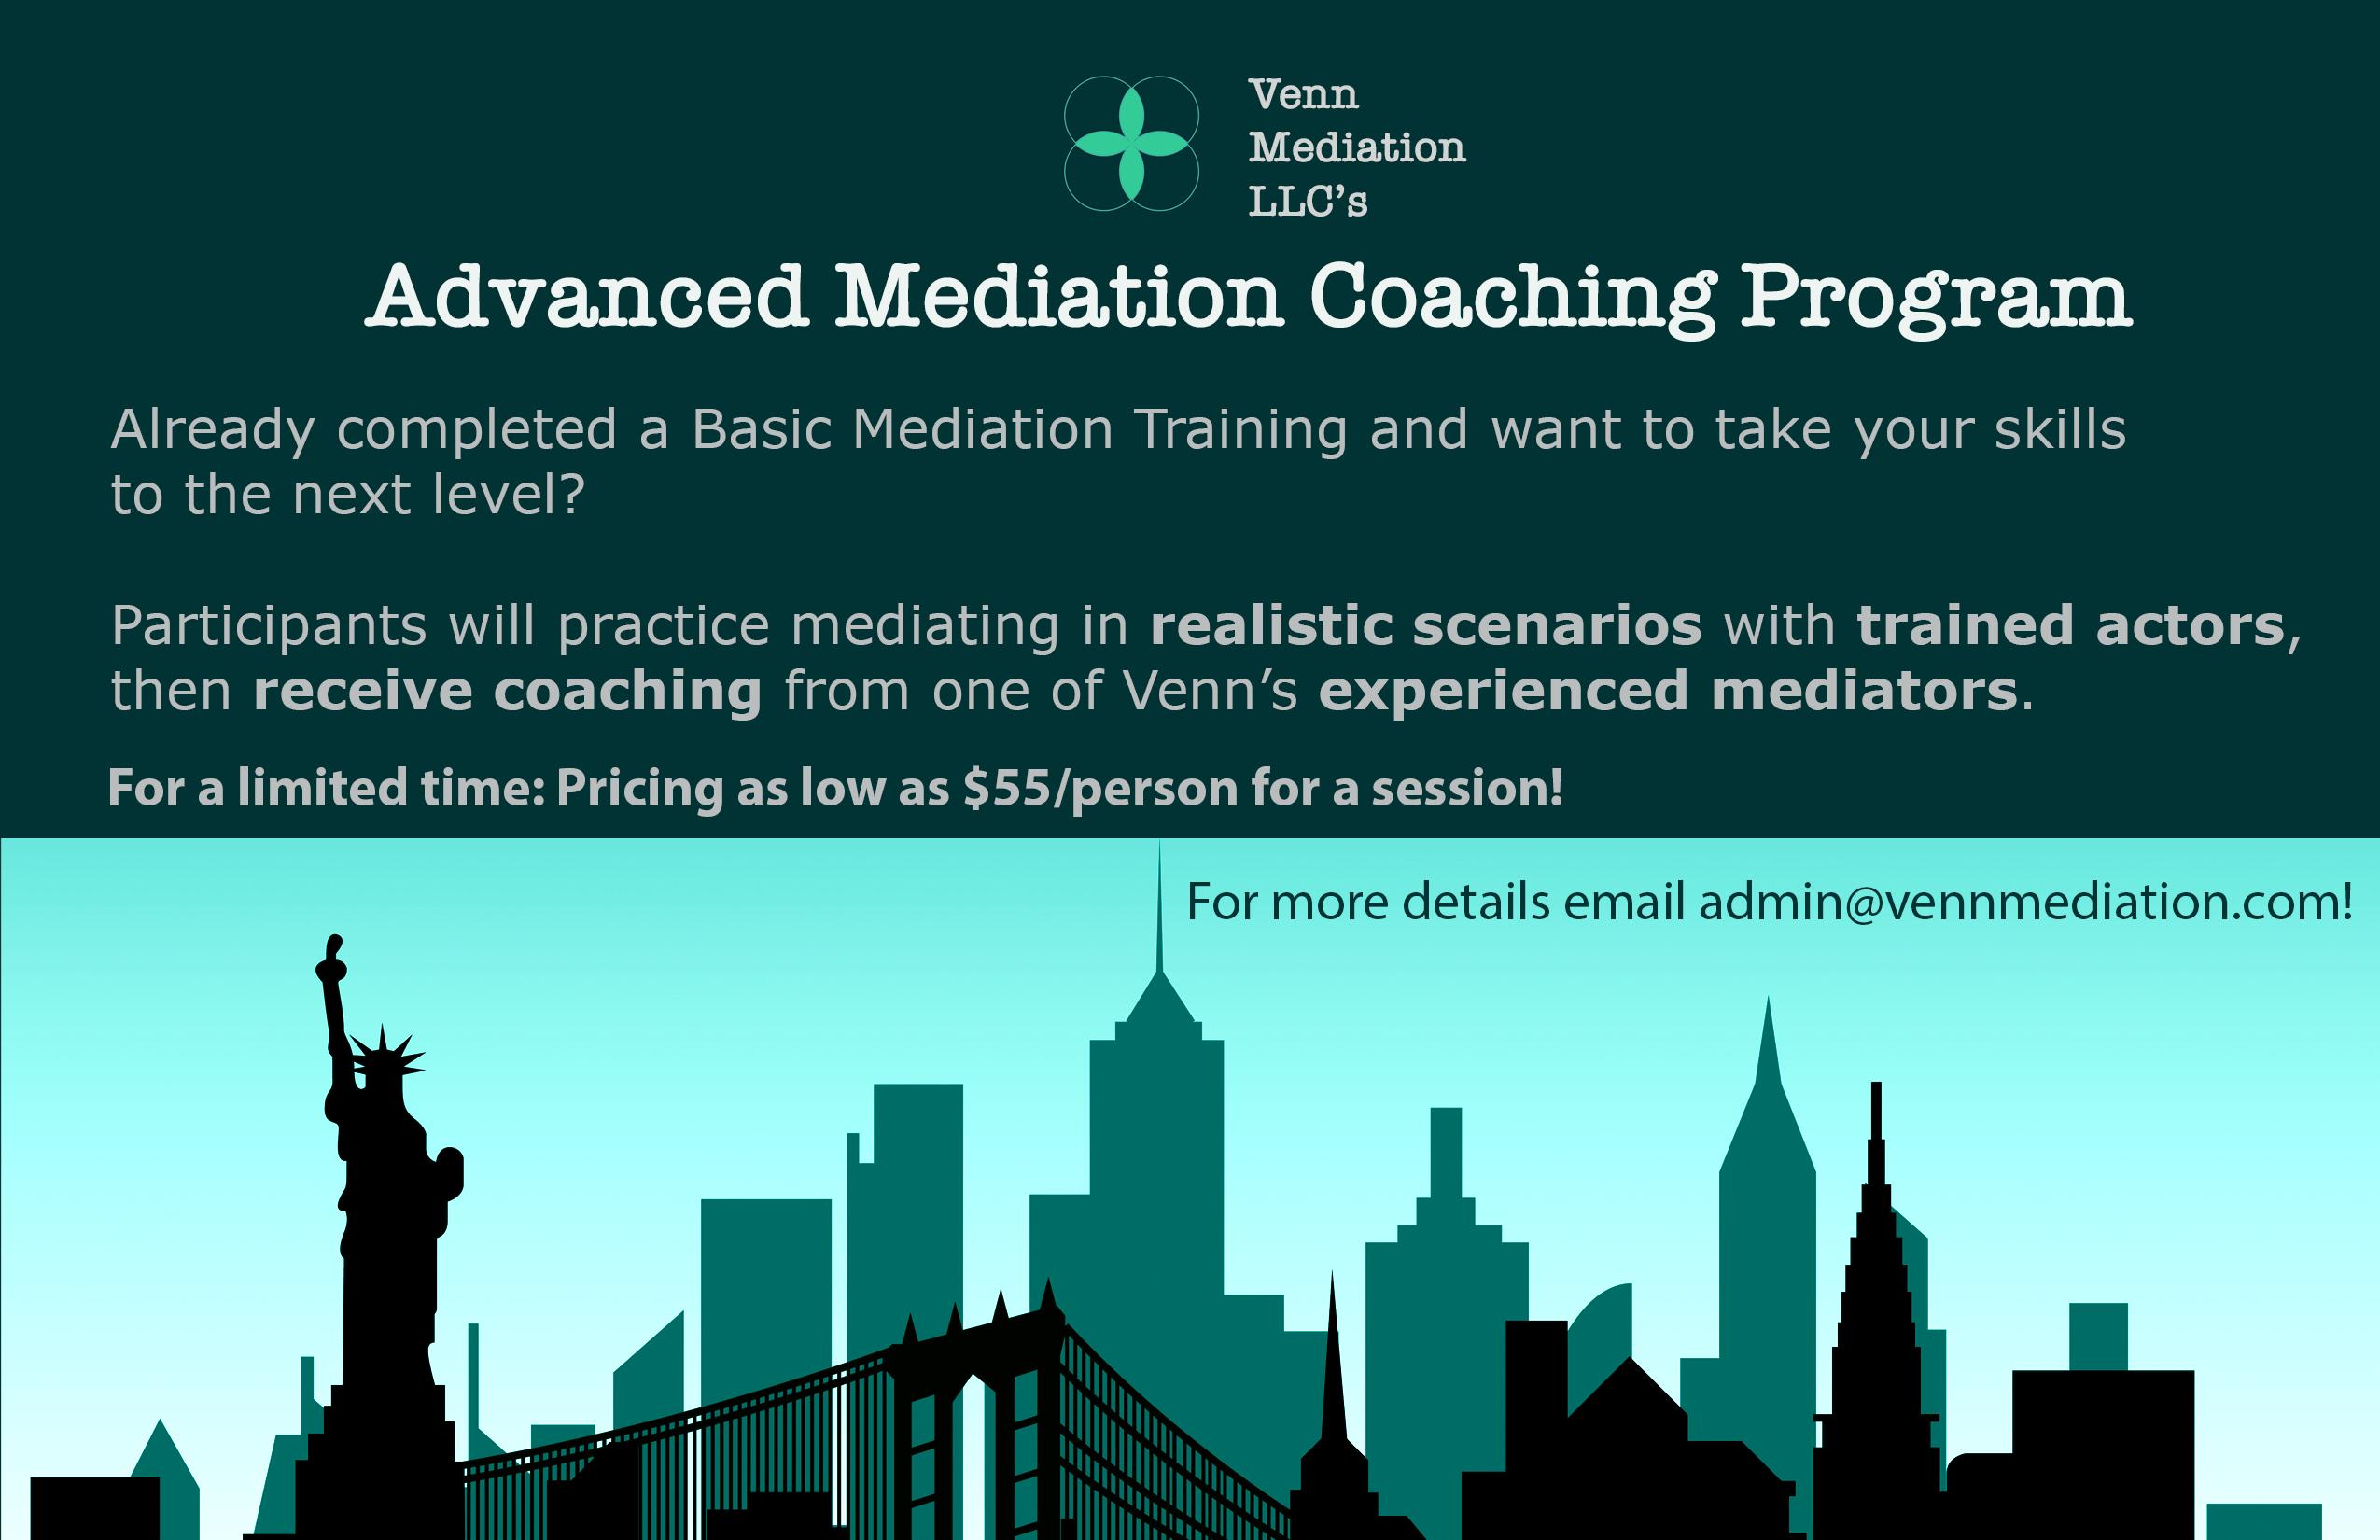 Advanced Mediation Coaching Program (AMCP)